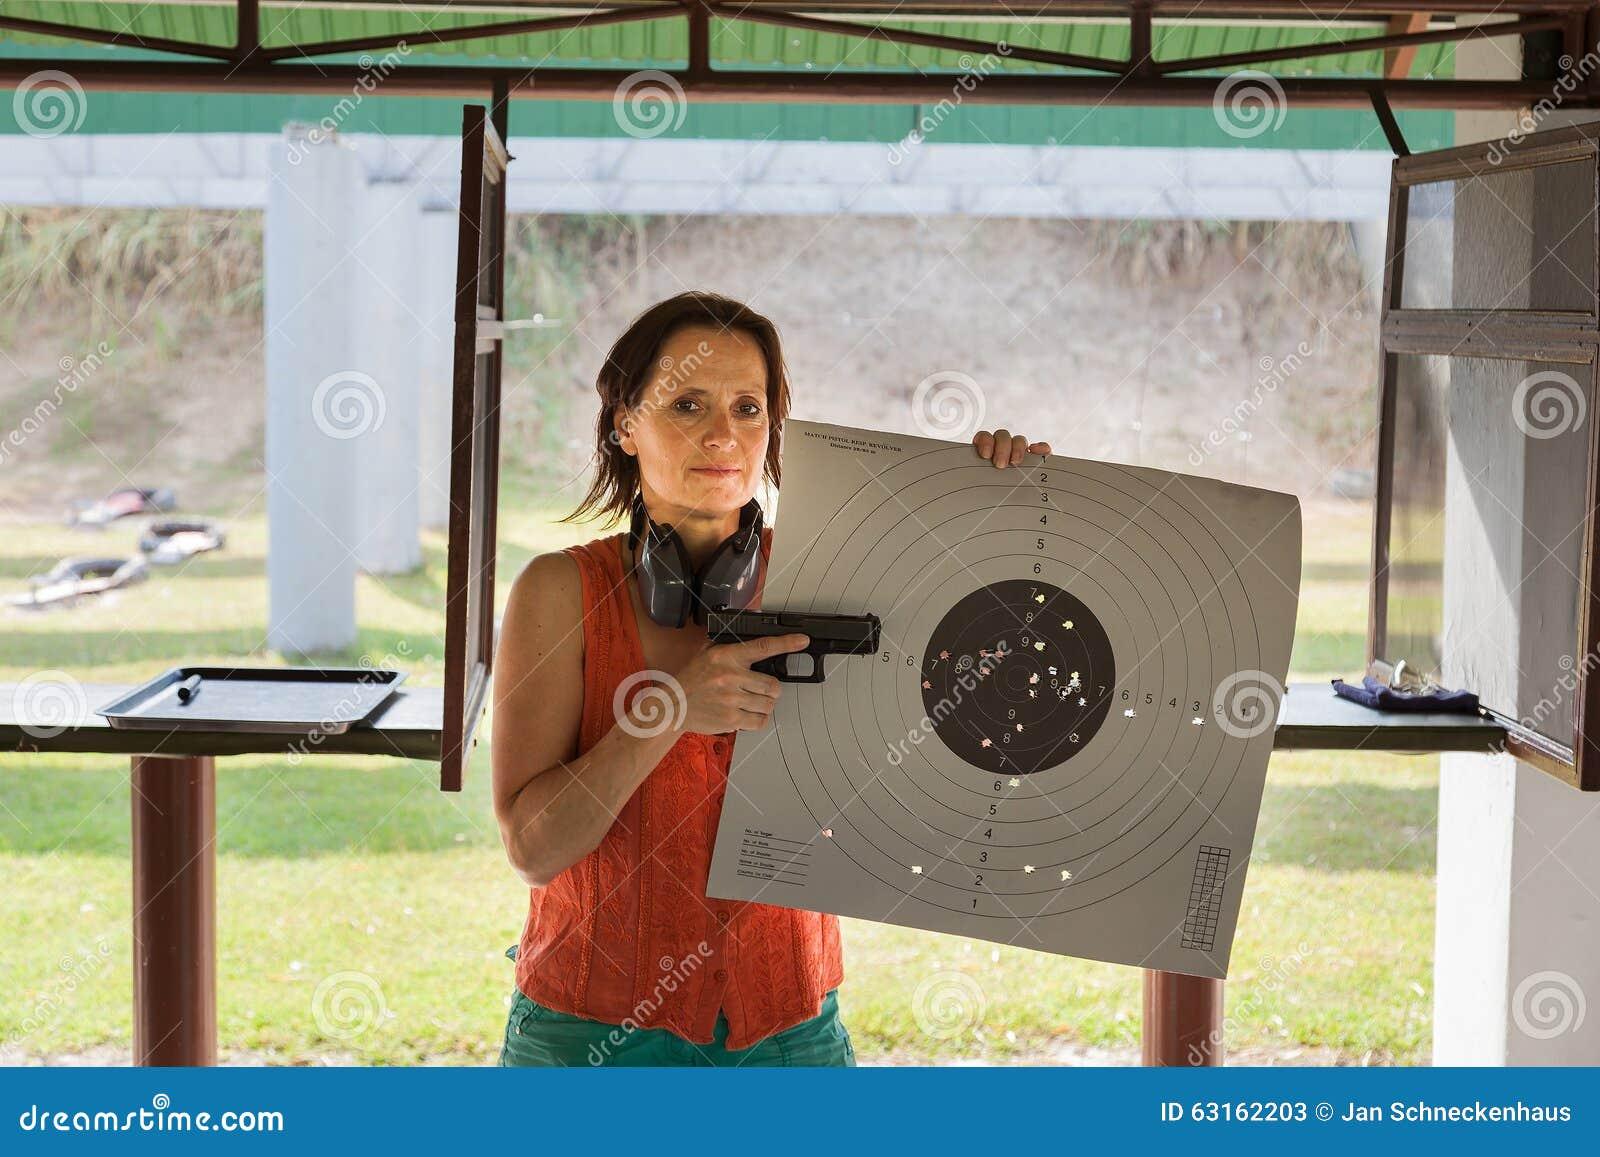 Video Of Woman At Shooting Range 75